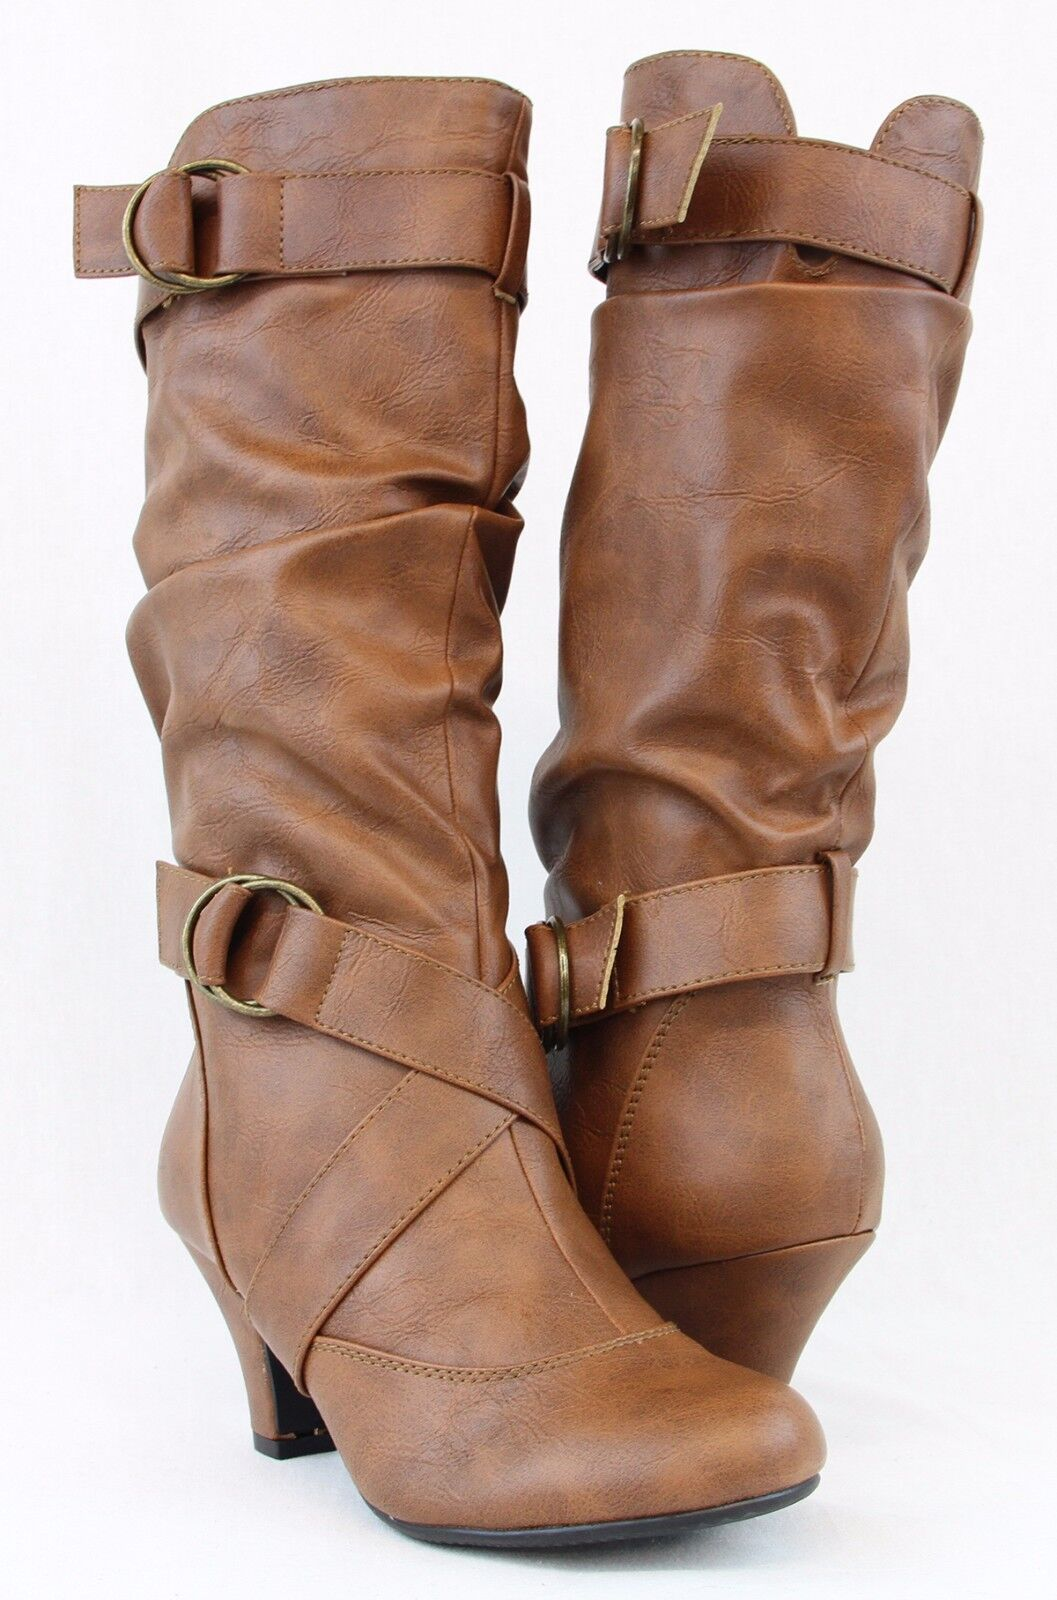 Women Boots Kitten Heels Style Fashion Mid Calf Slouch Faux Leather Cross Design